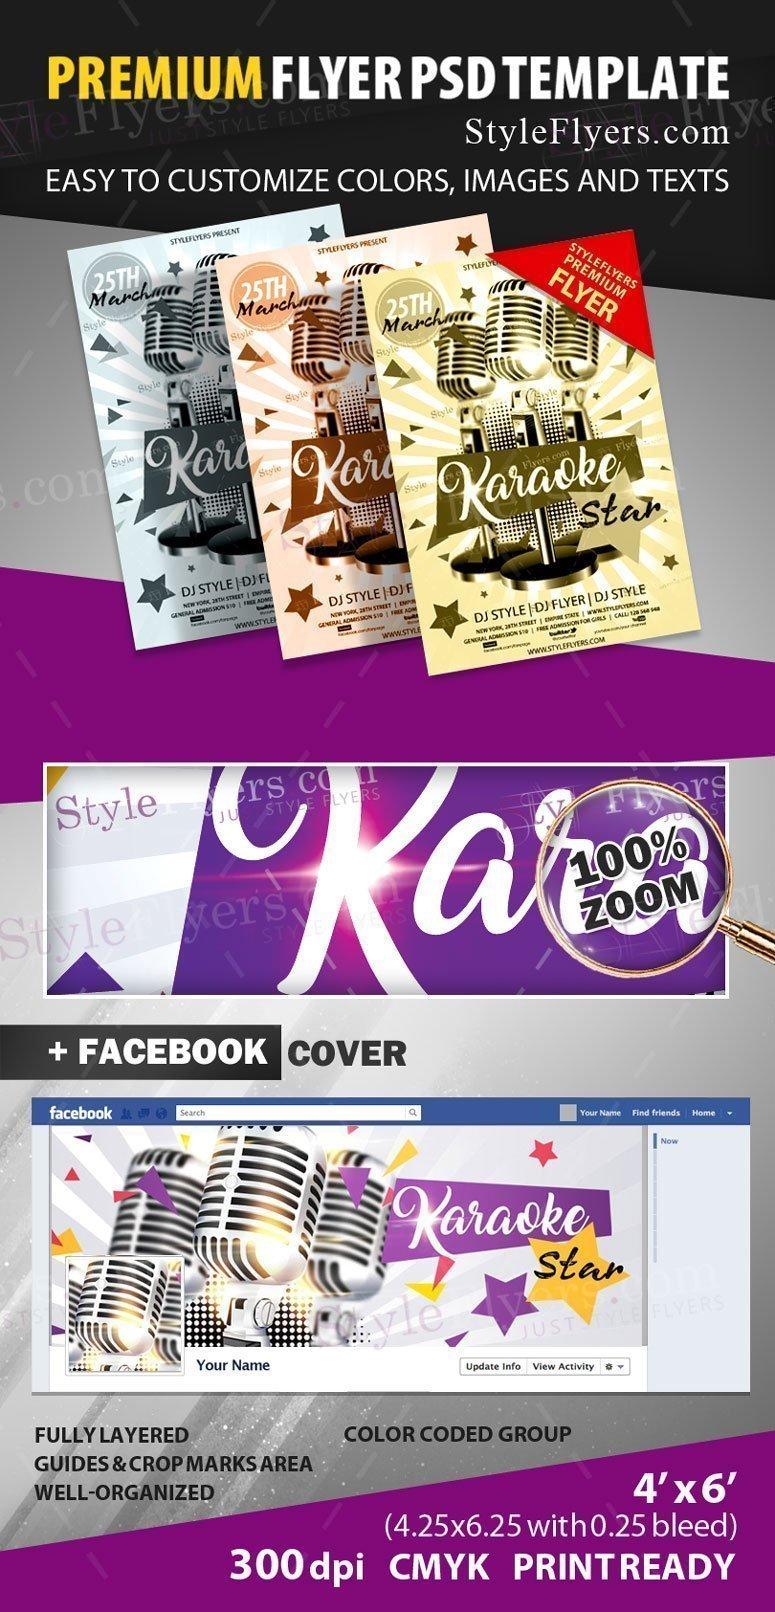 karaoke star preview_premium